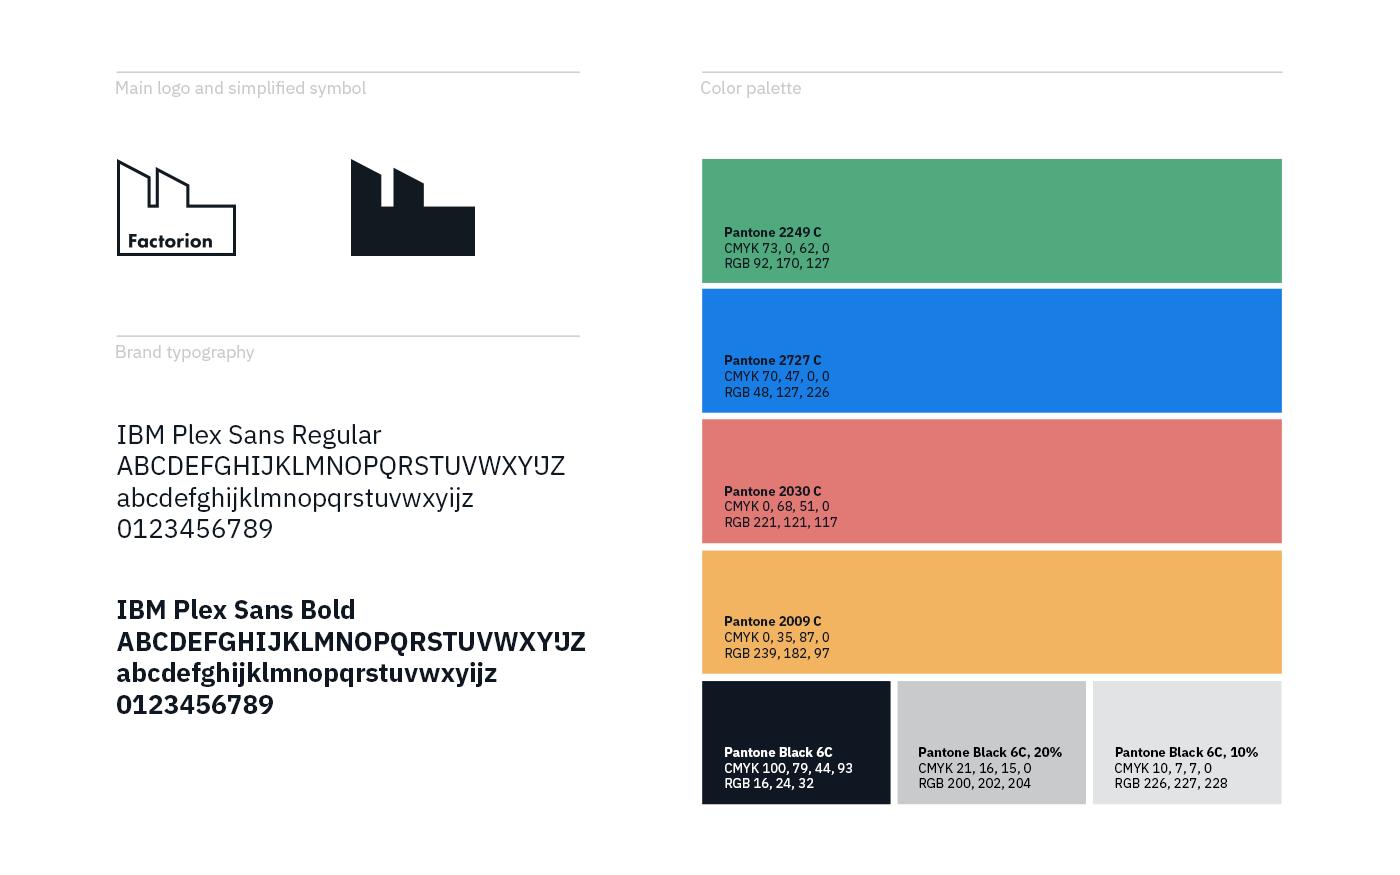 Factorion brand elements